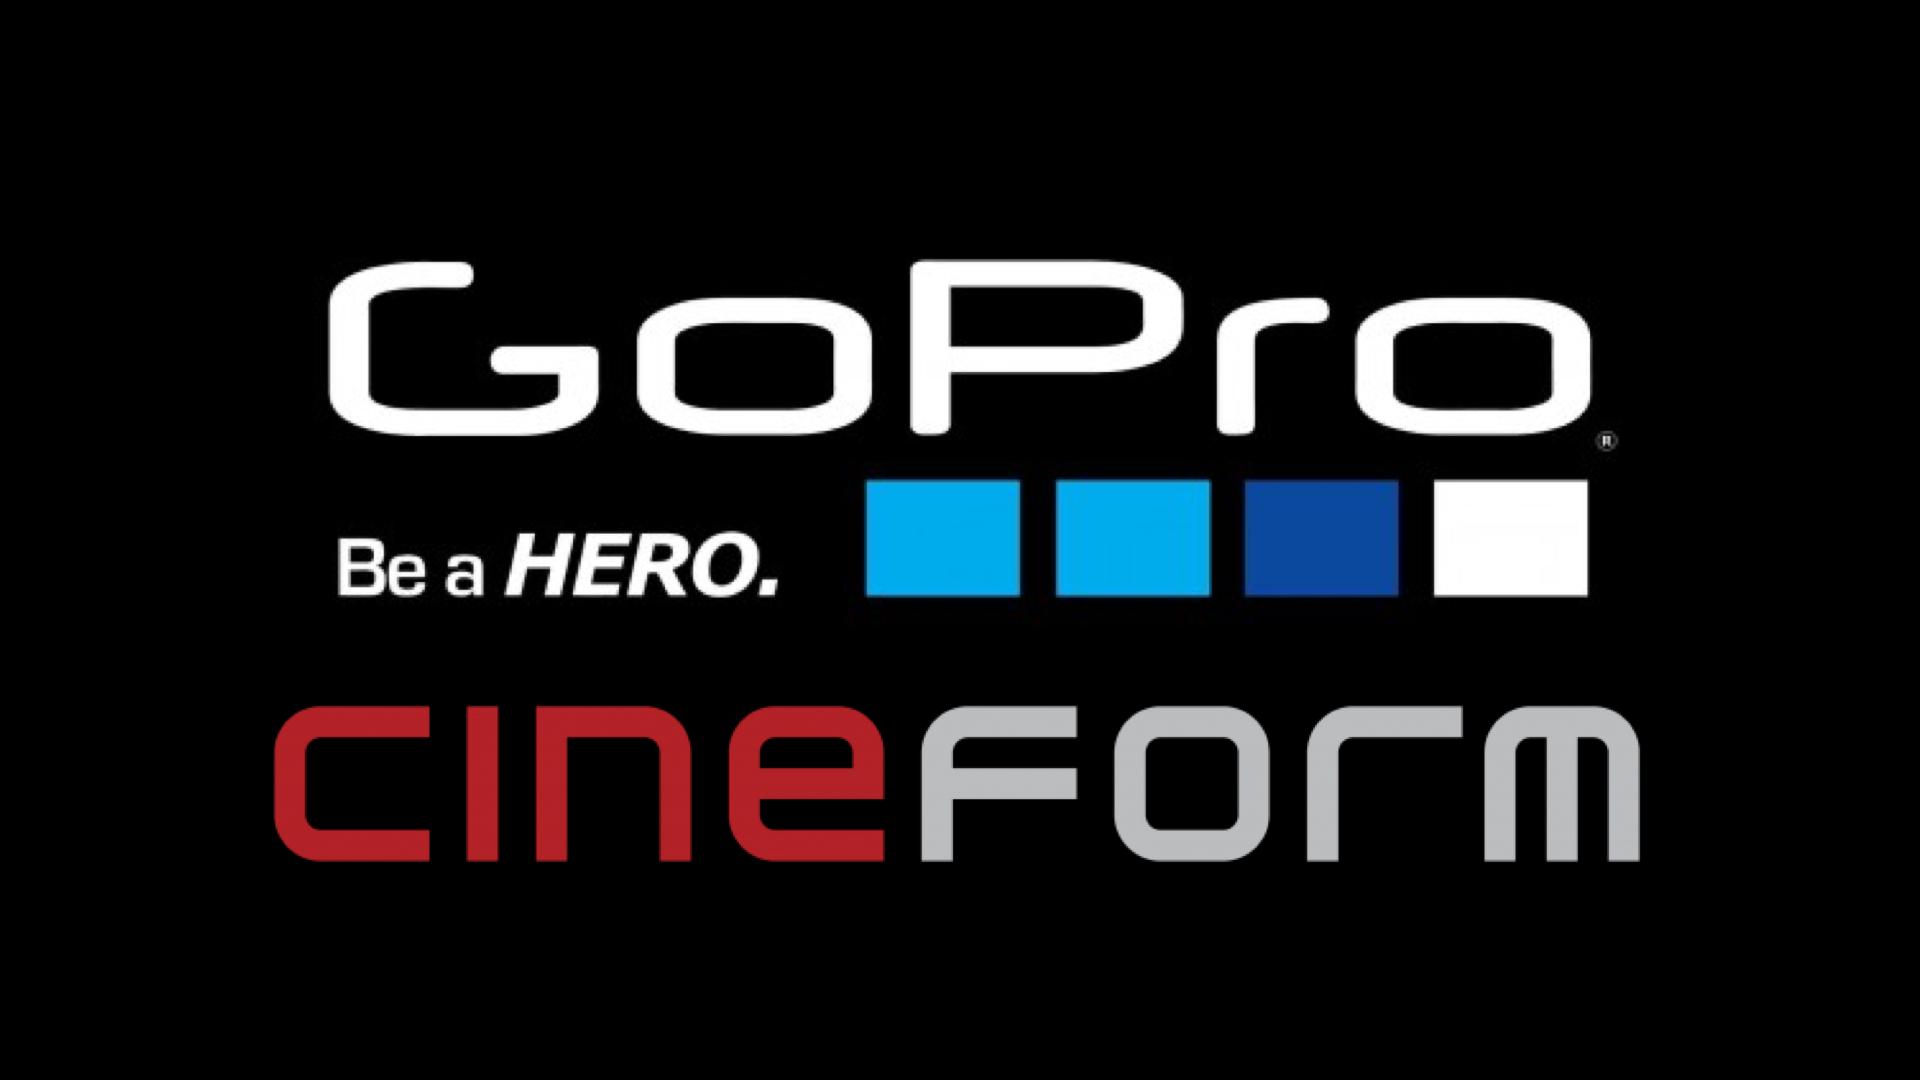 GoProの古くも効率的なCineFormコーデックがオープンソースに